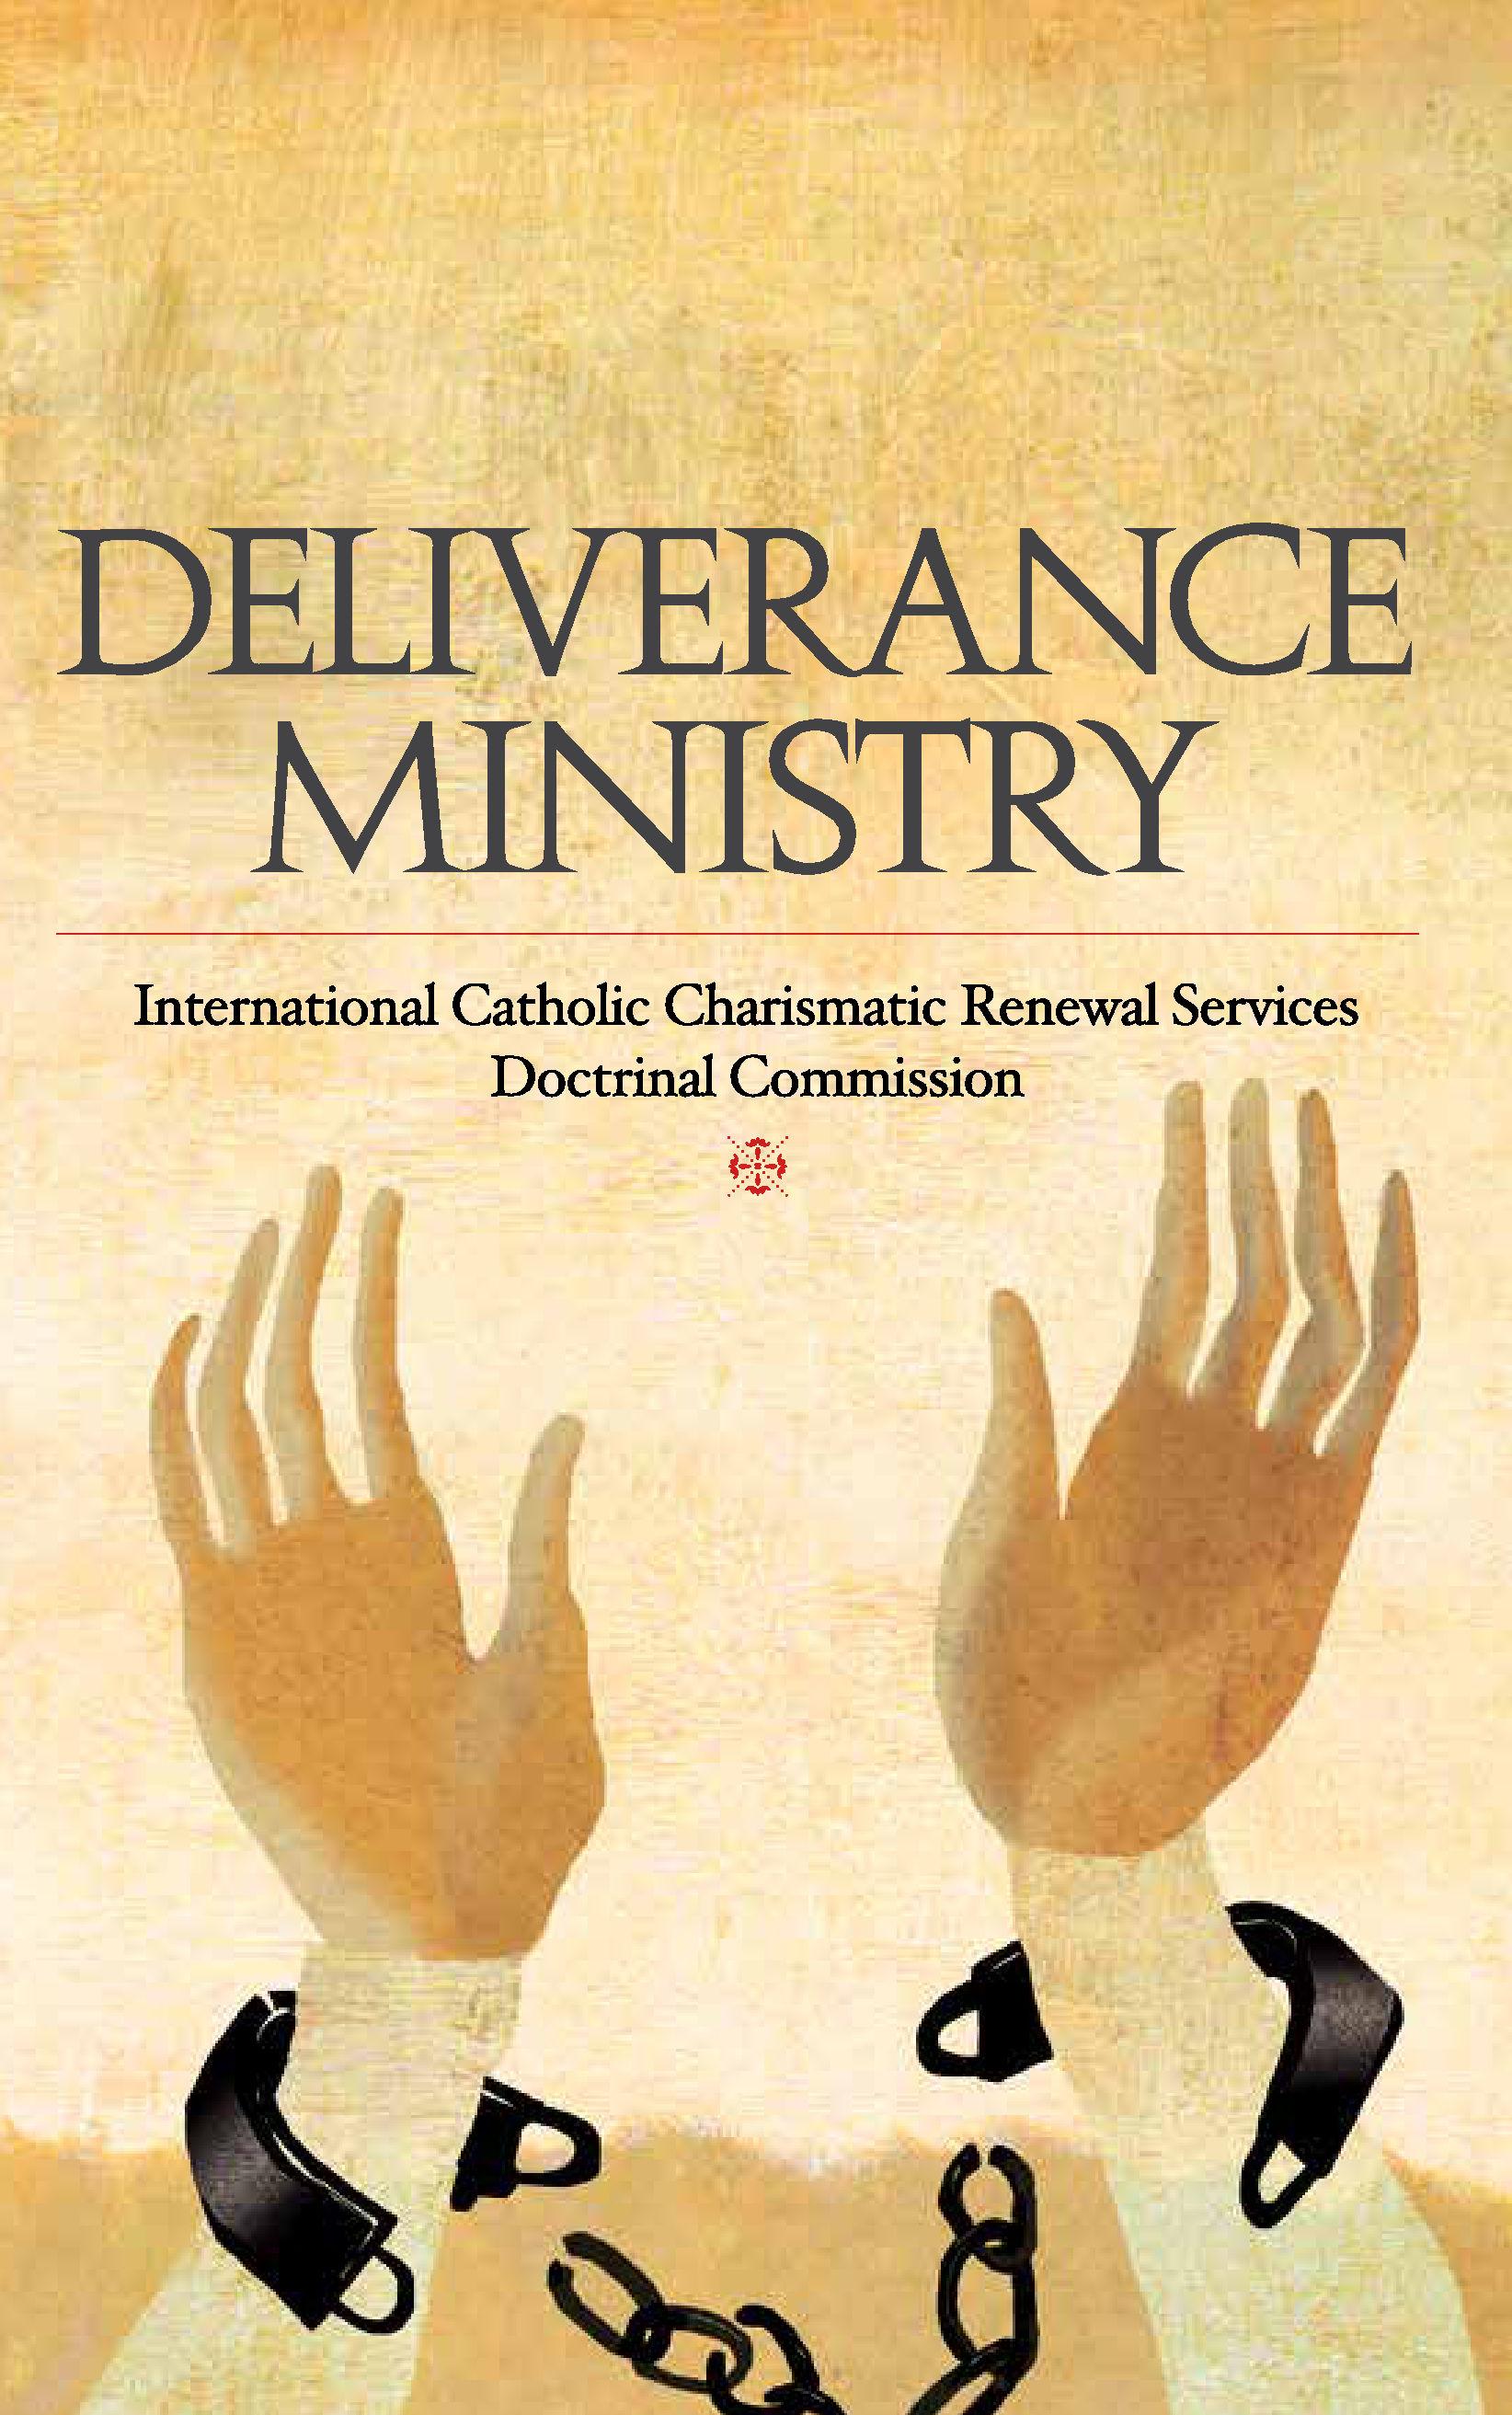 Catholic Charismatic Renewal - National Service Committee